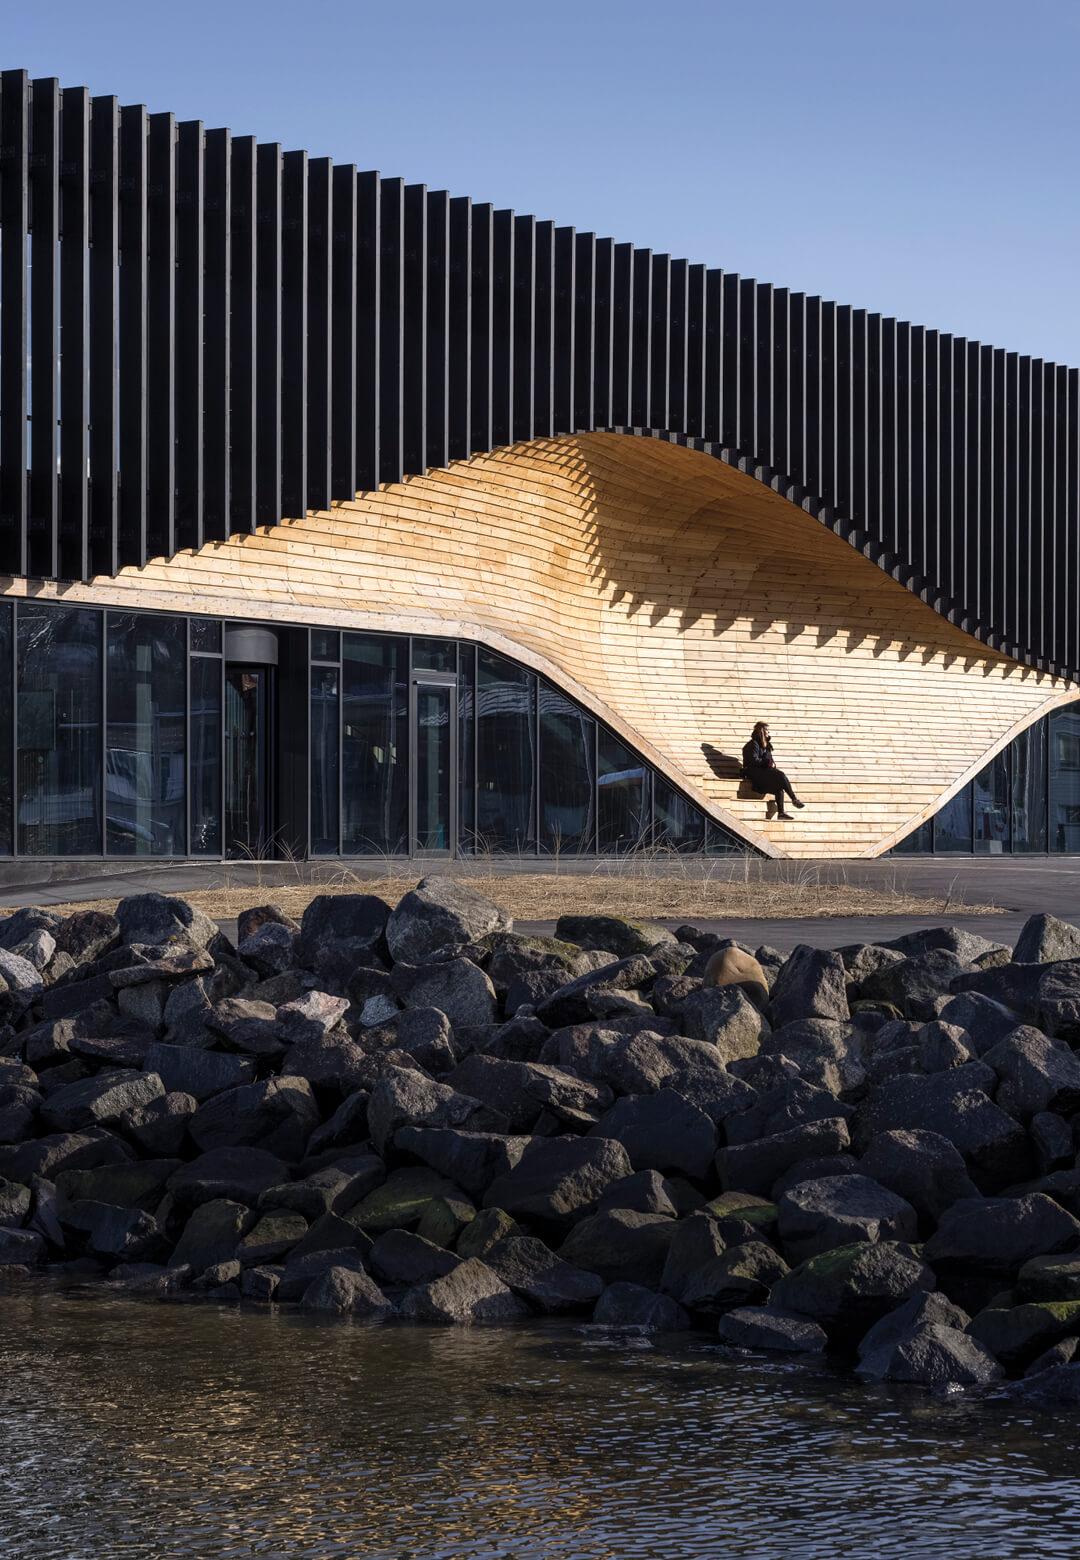 A wave shaped pocket dresses the exterior of the Lemvig Klimatorium in Denmark designed by 3Xn | Lemvig Klimatorium by 3XN | STIRworld